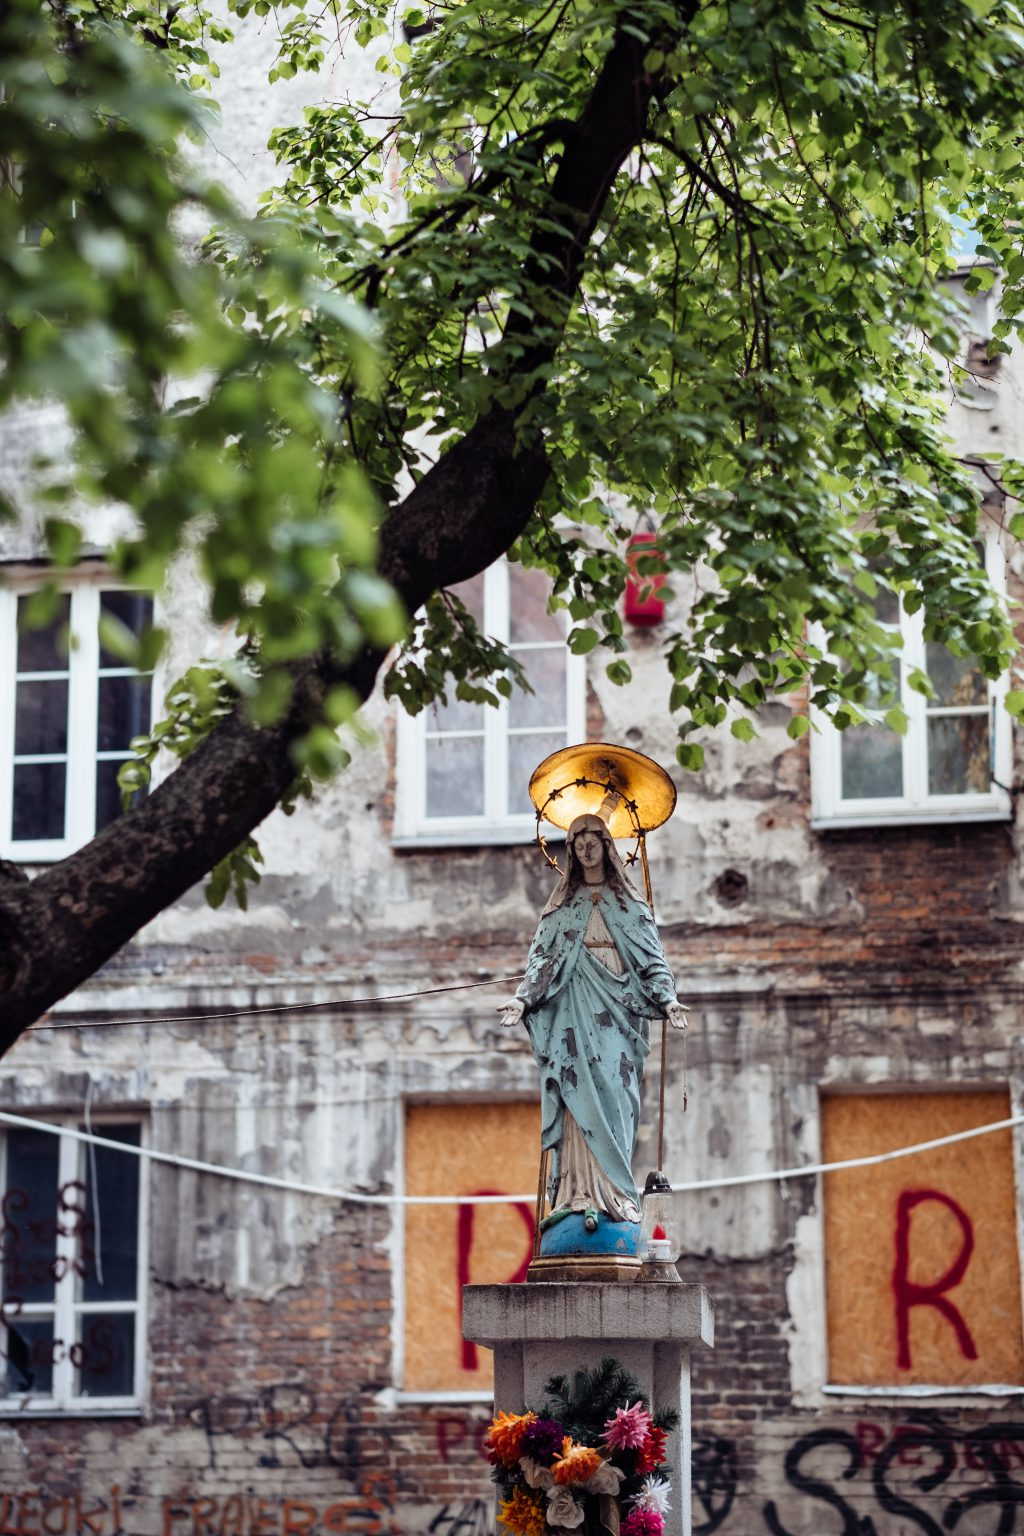 Catholic holy figure worship place outside a poor neighbourhood building 4 - free stock photo